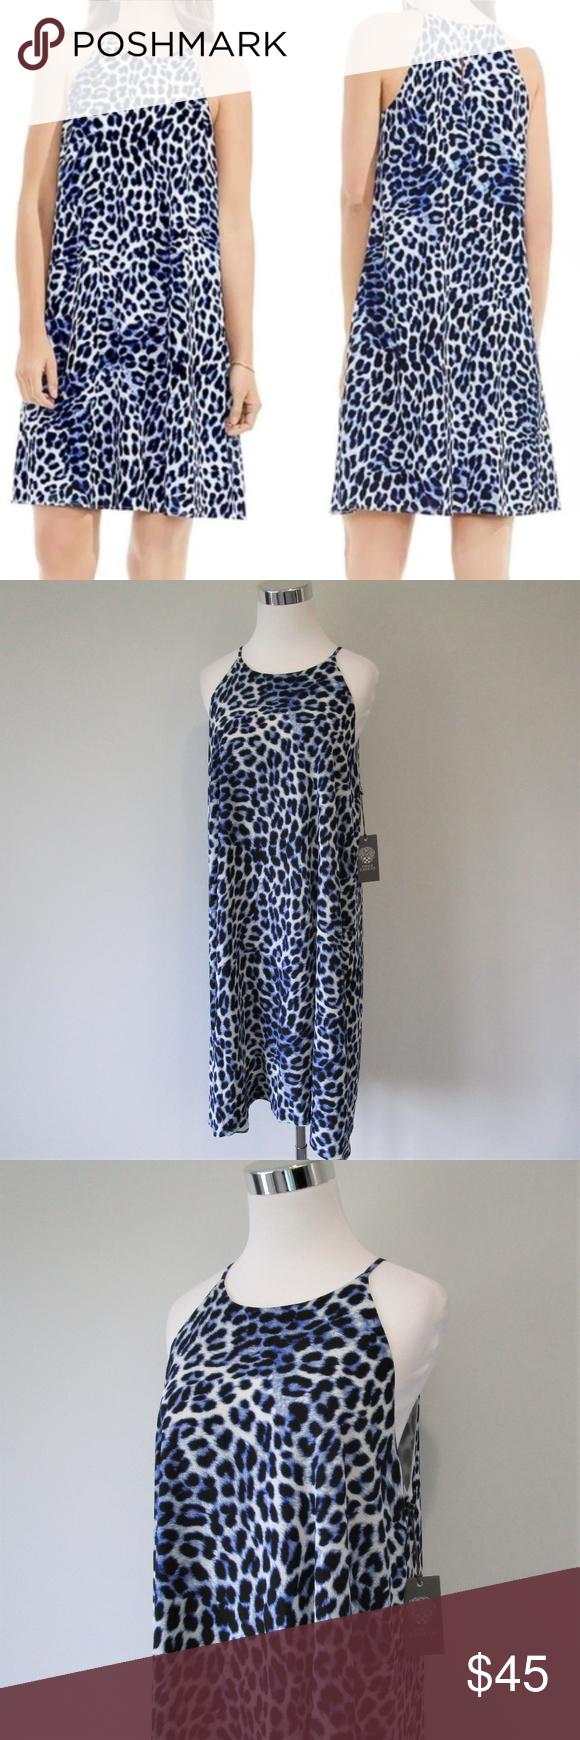 Nwt Vince Camuto Blue Leopard Halter Shift Dress Clothes Design Midi Shift Dress Shift Dress [ 1740 x 580 Pixel ]